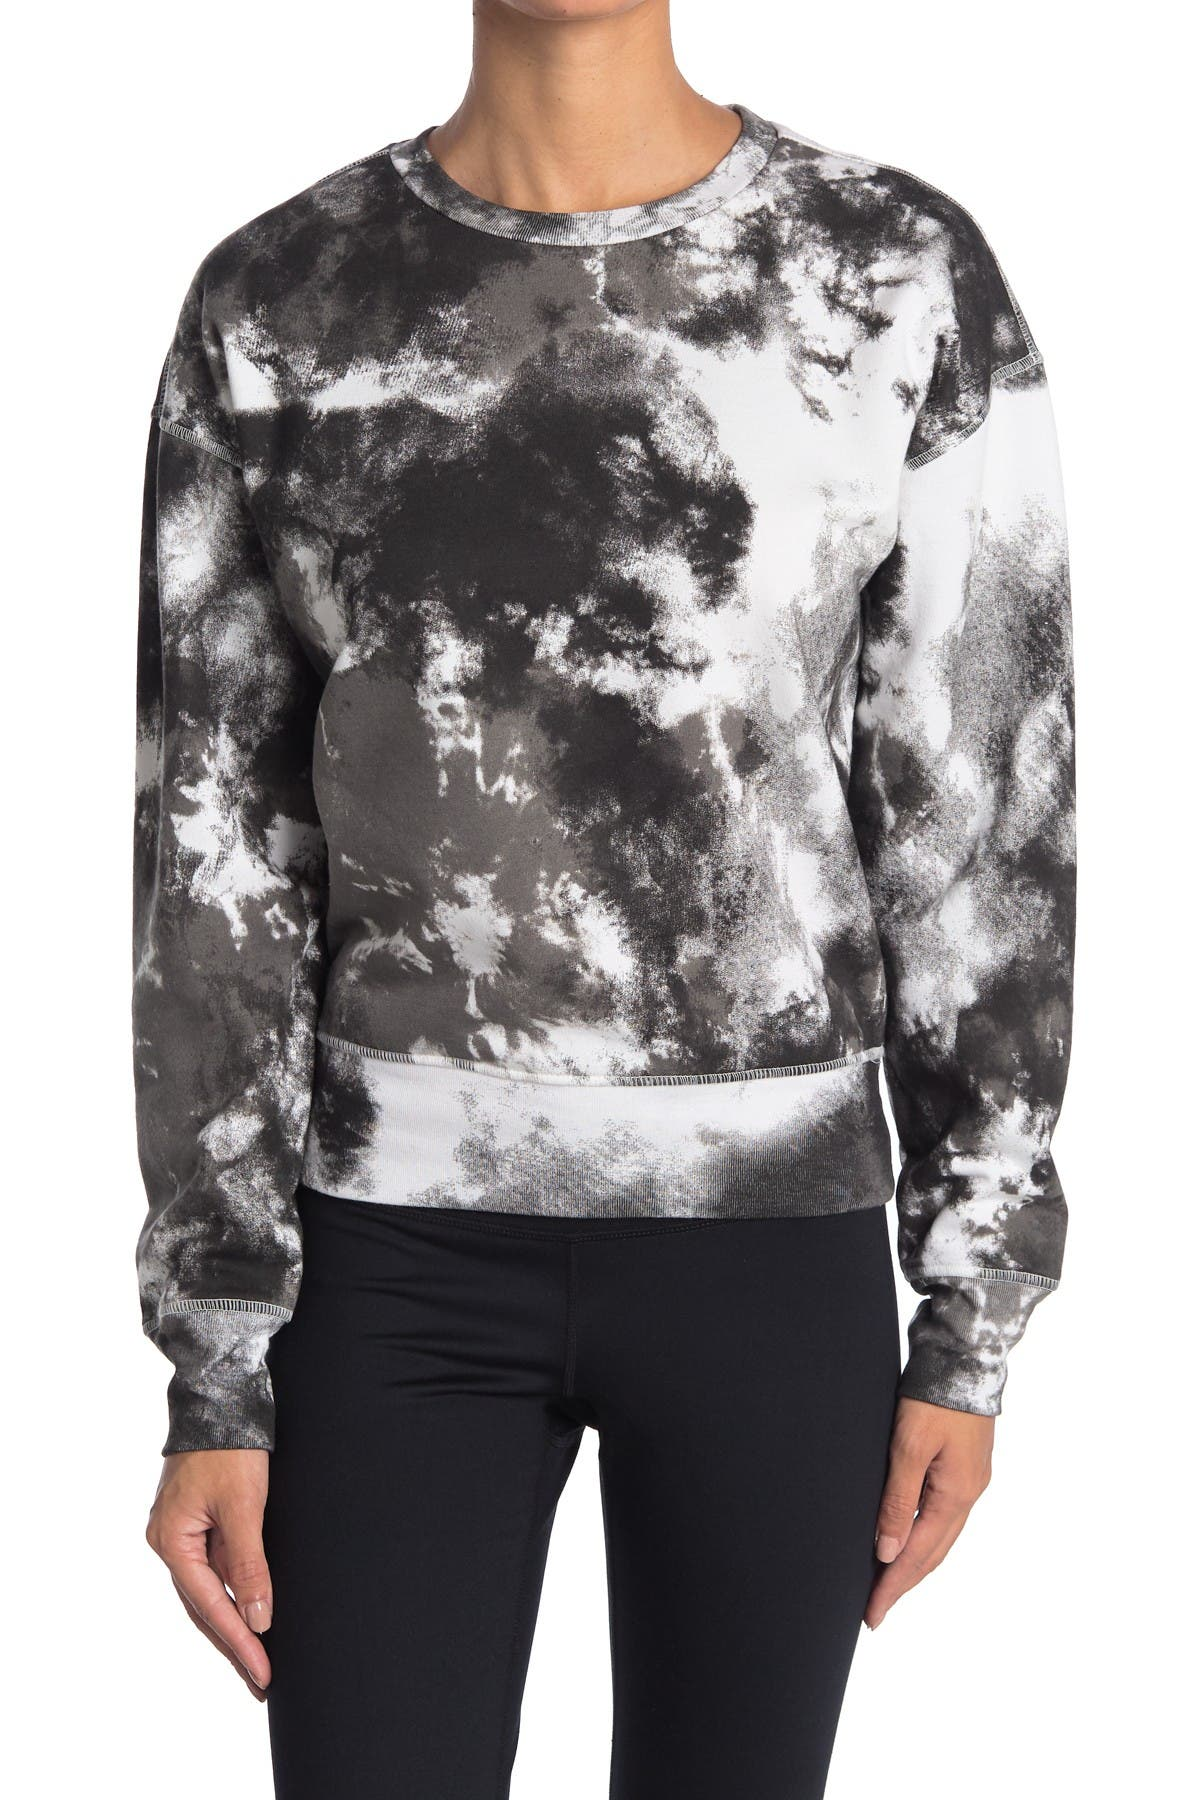 Image of Z By Zella Maisie Tie Dye Pullover Sweatshirt